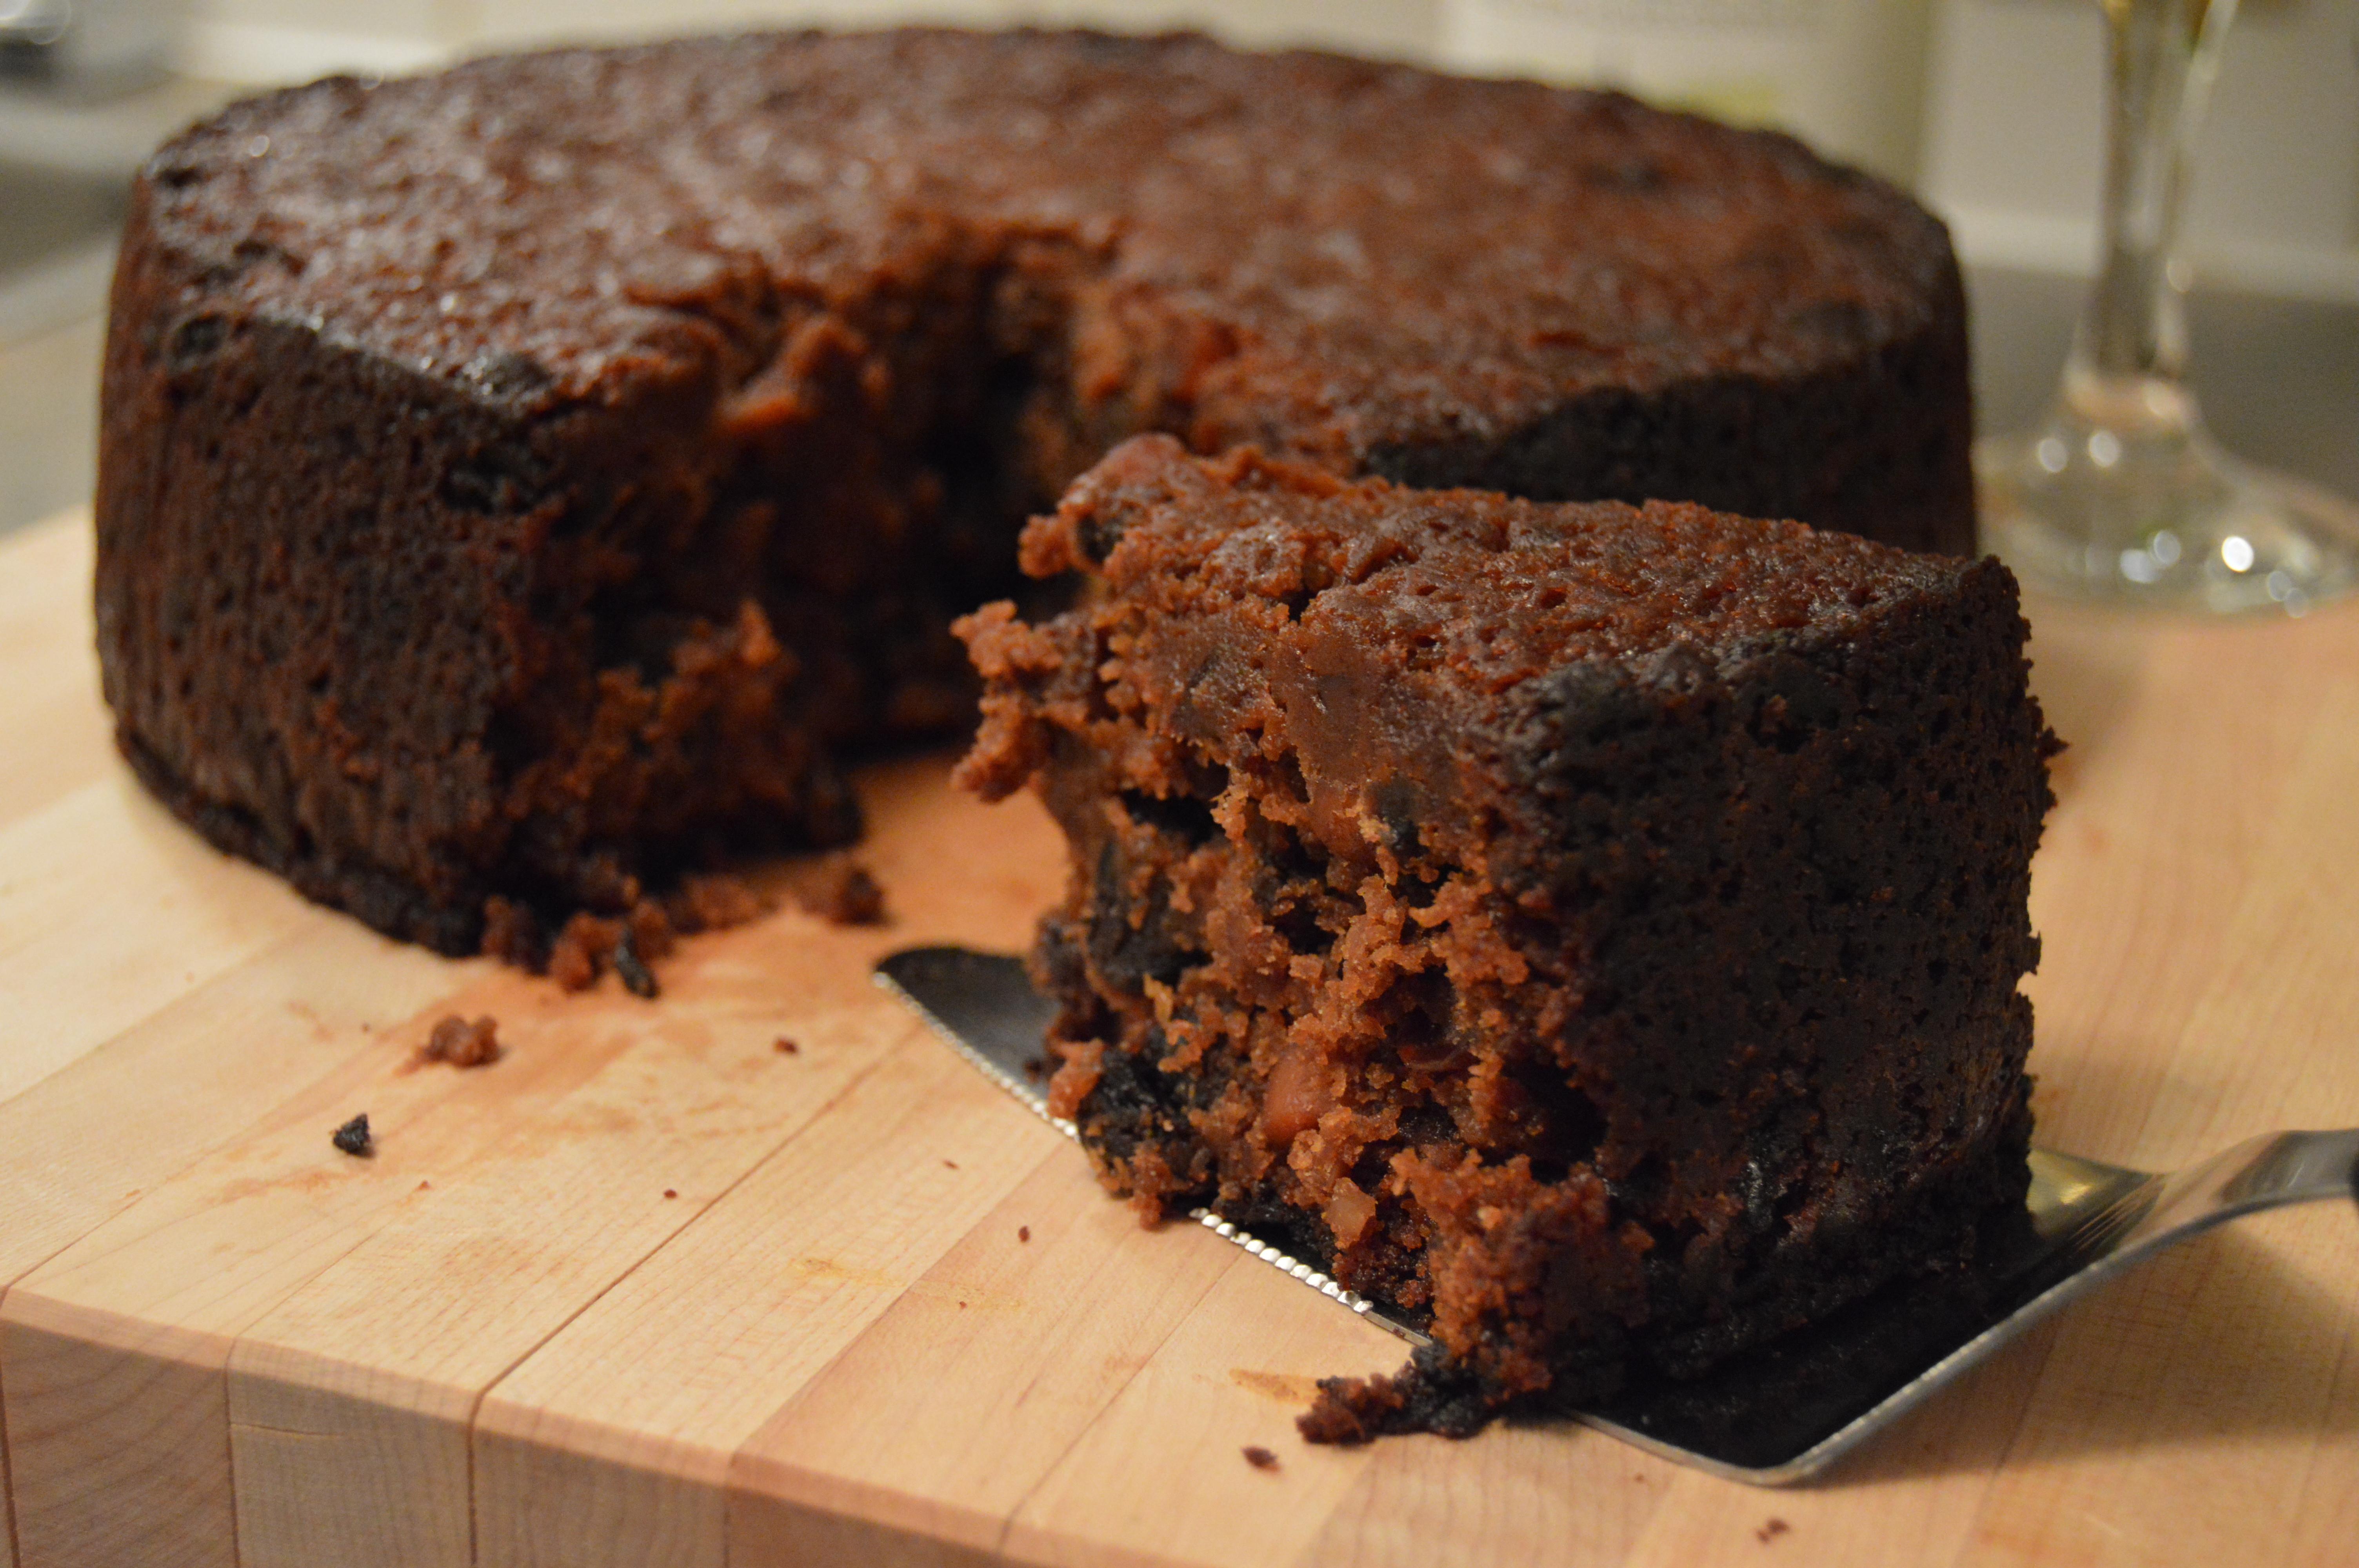 Black Cake Recipe  Fruitcake Taste Test Christmas 2014 – Grated Nutmeg